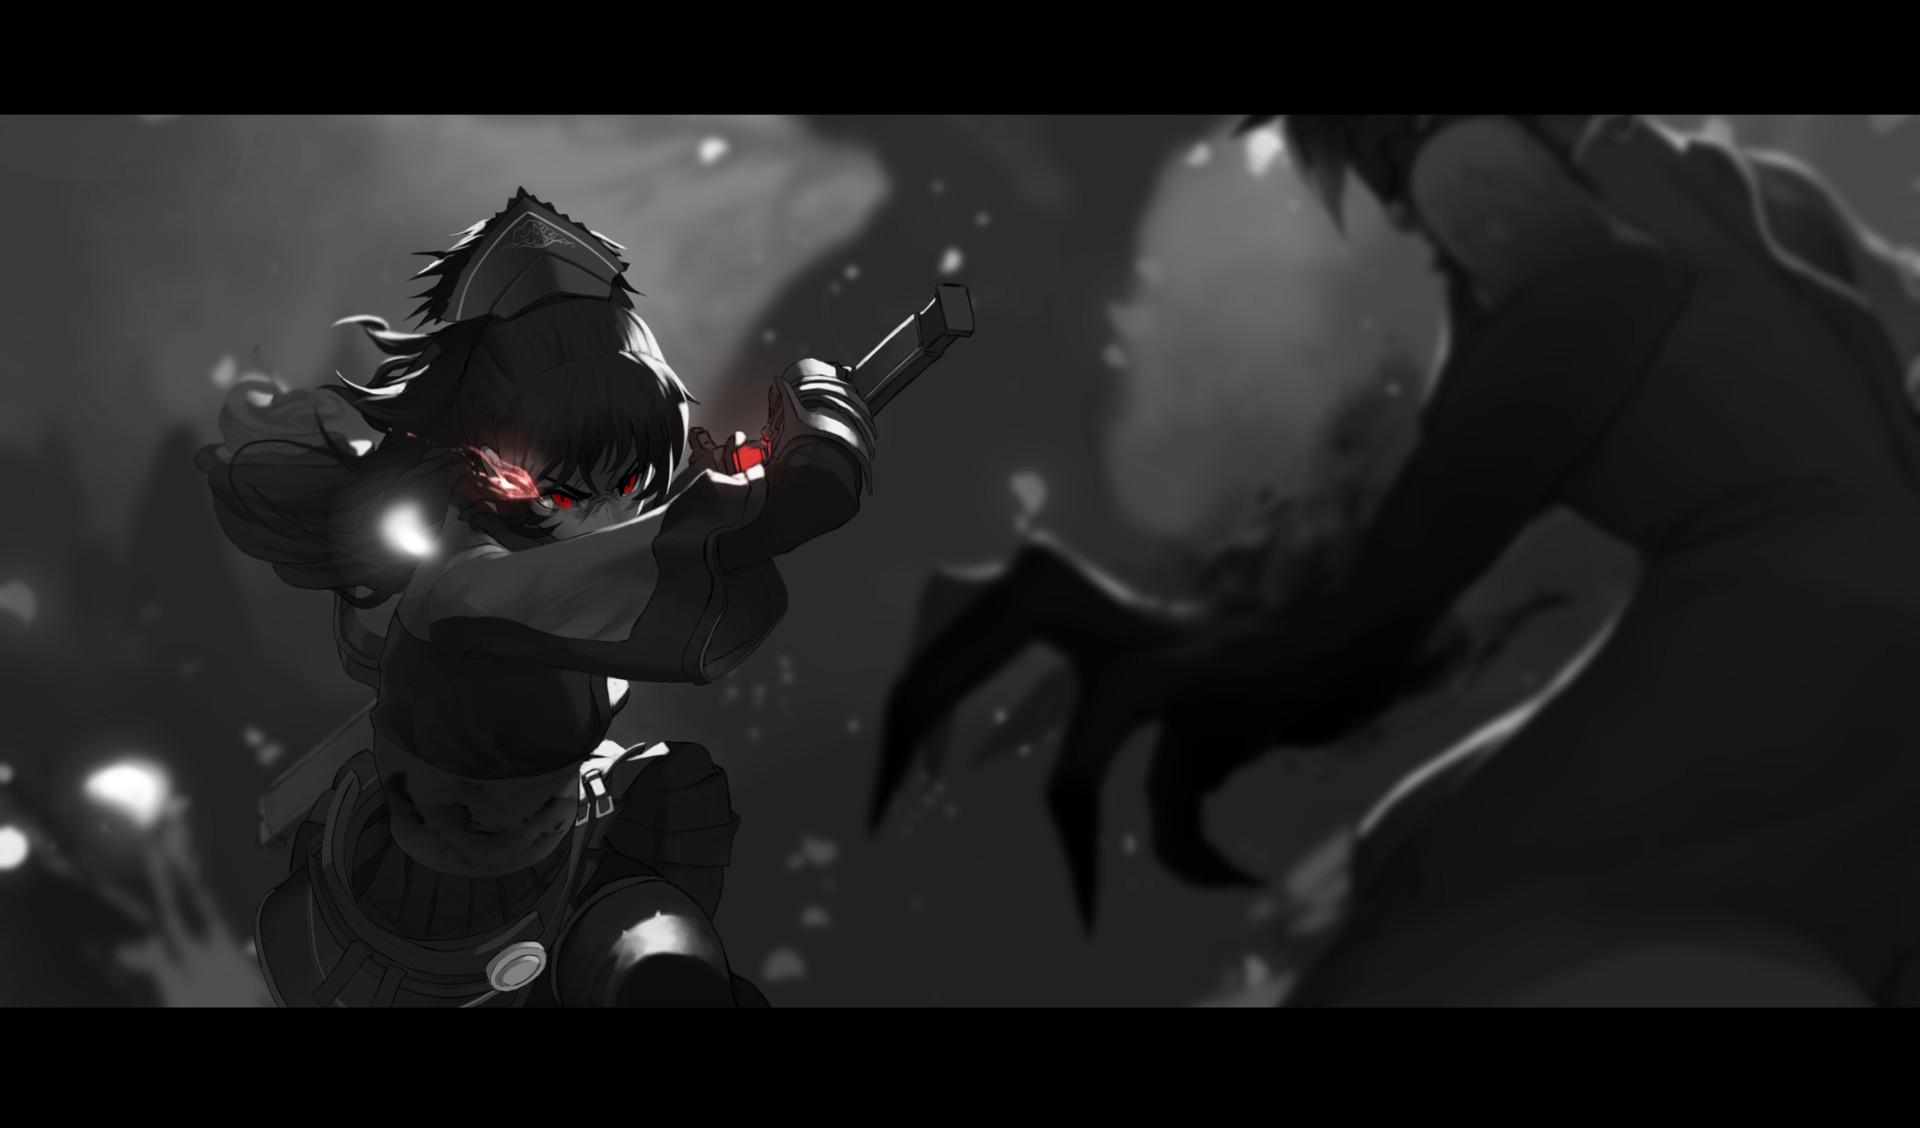 Bach do raven